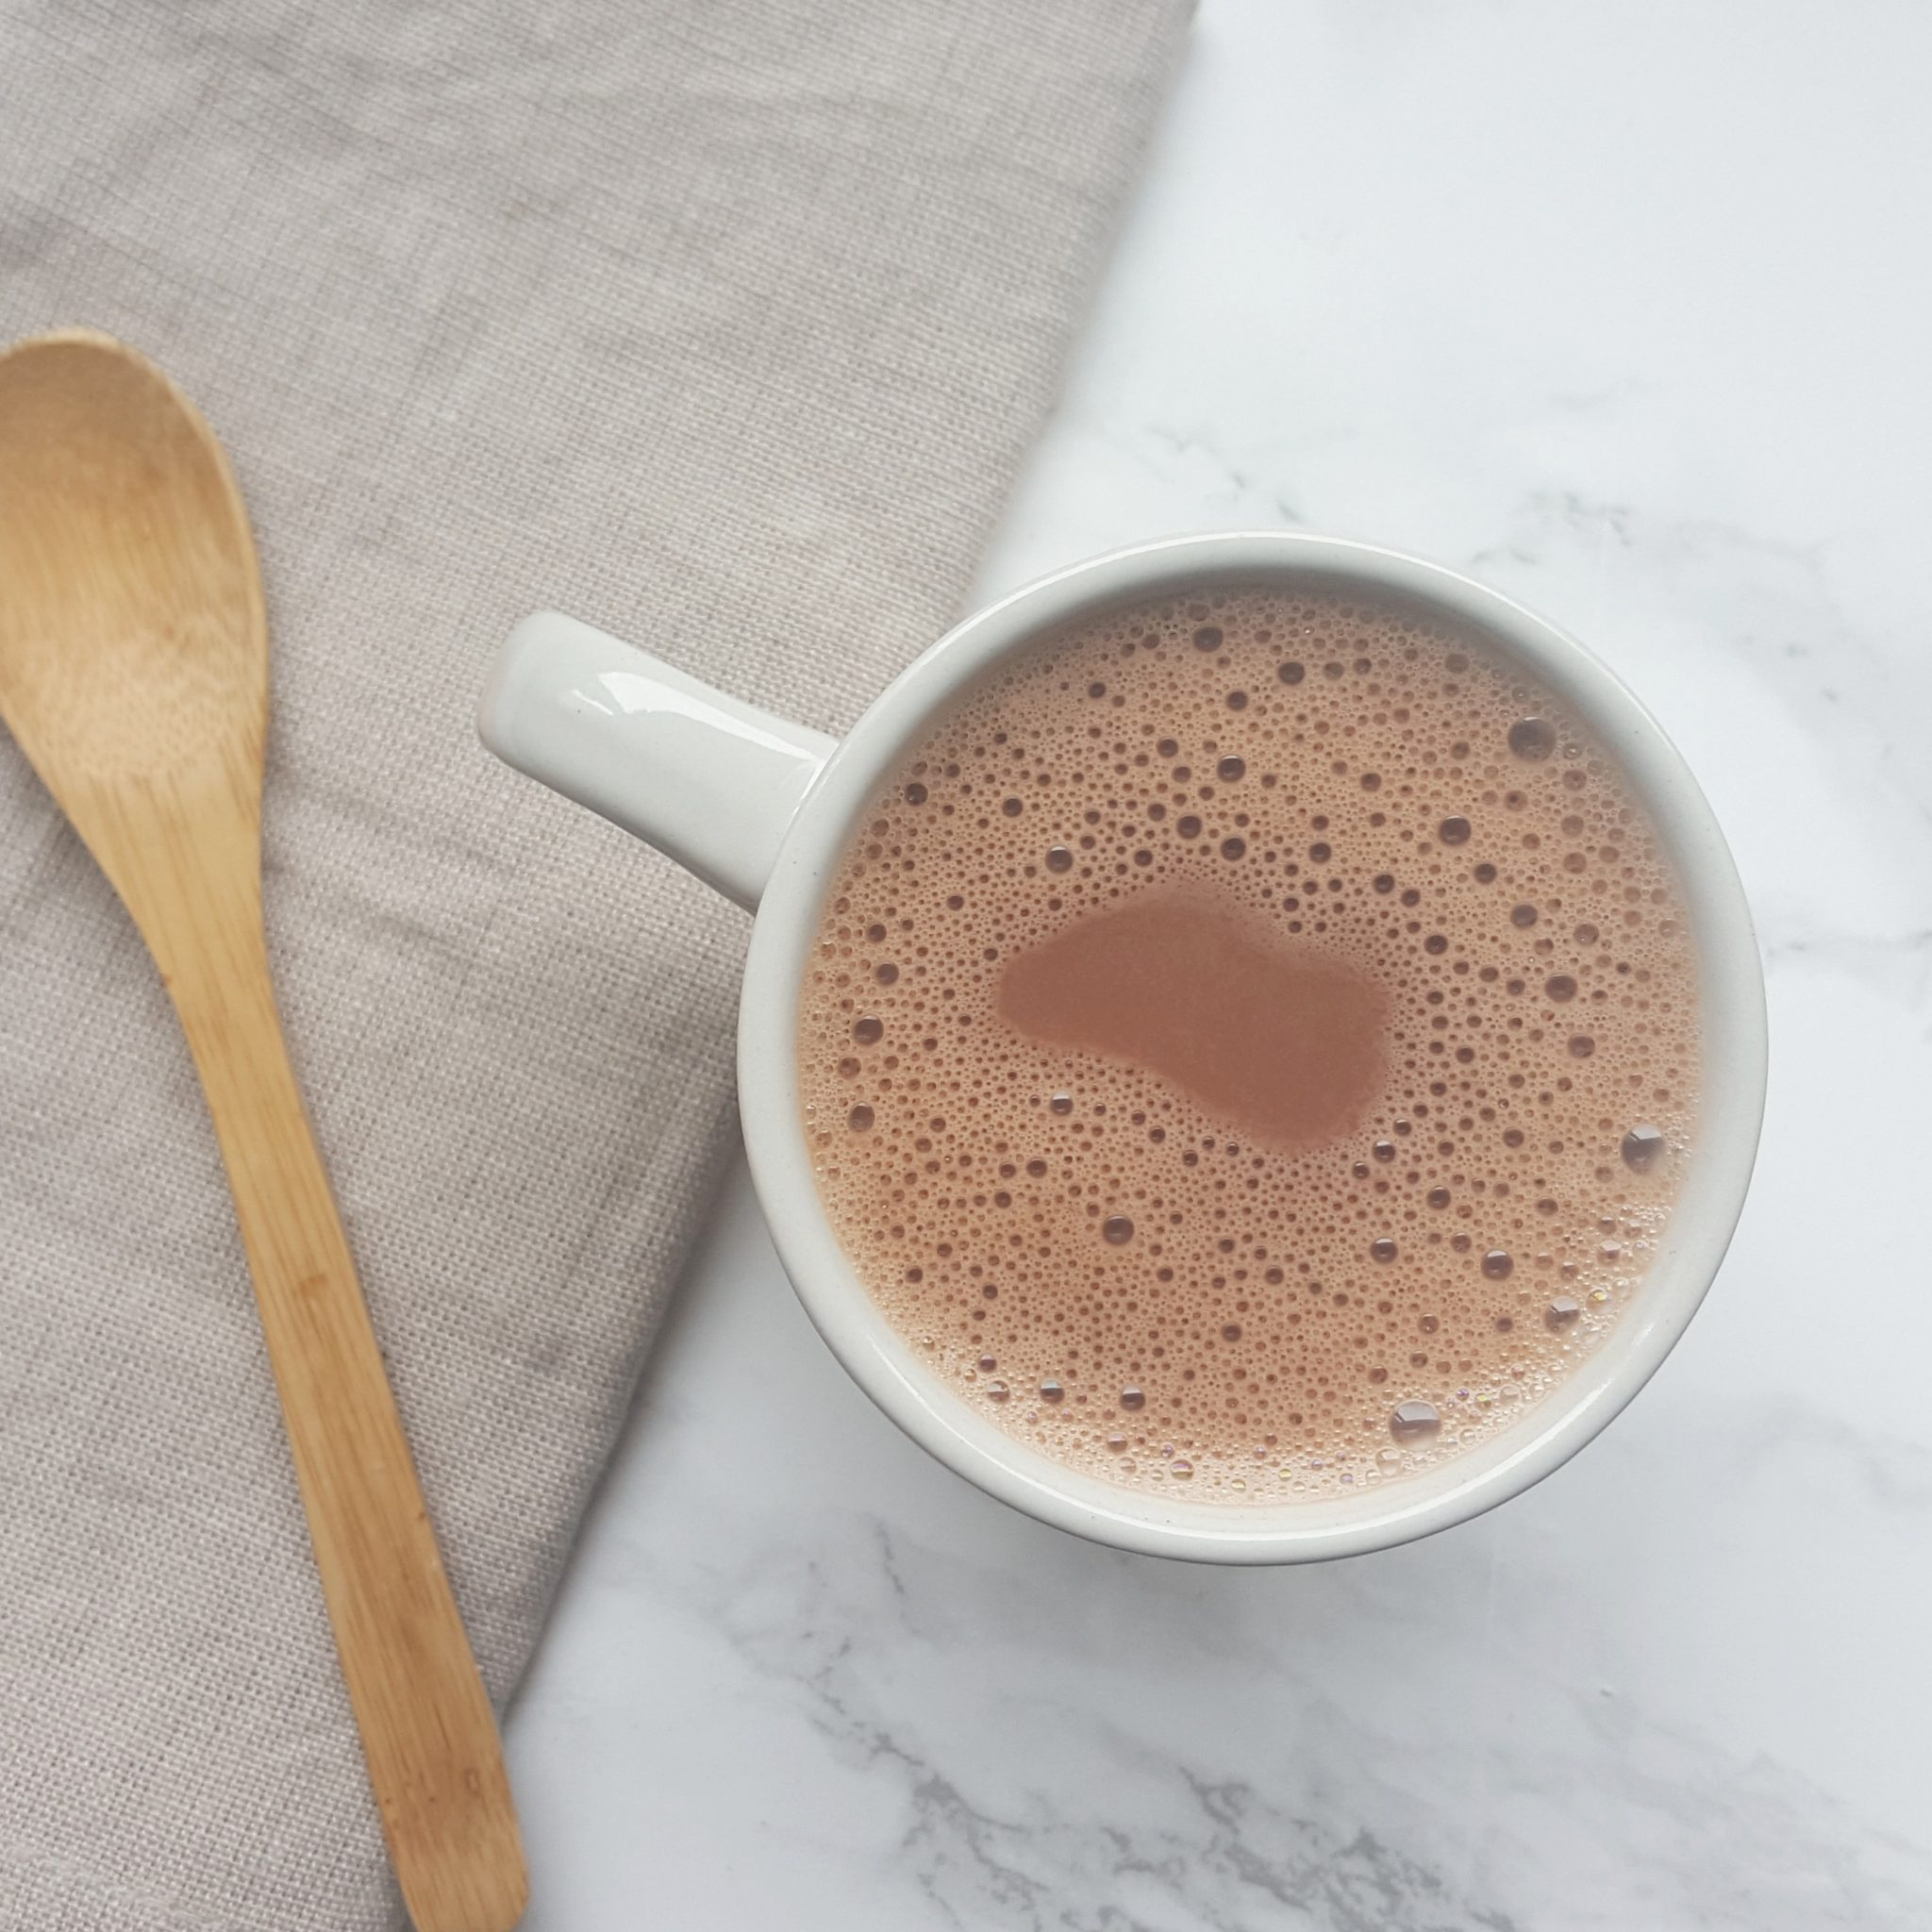 Recept: Paleo warme chocolademelk